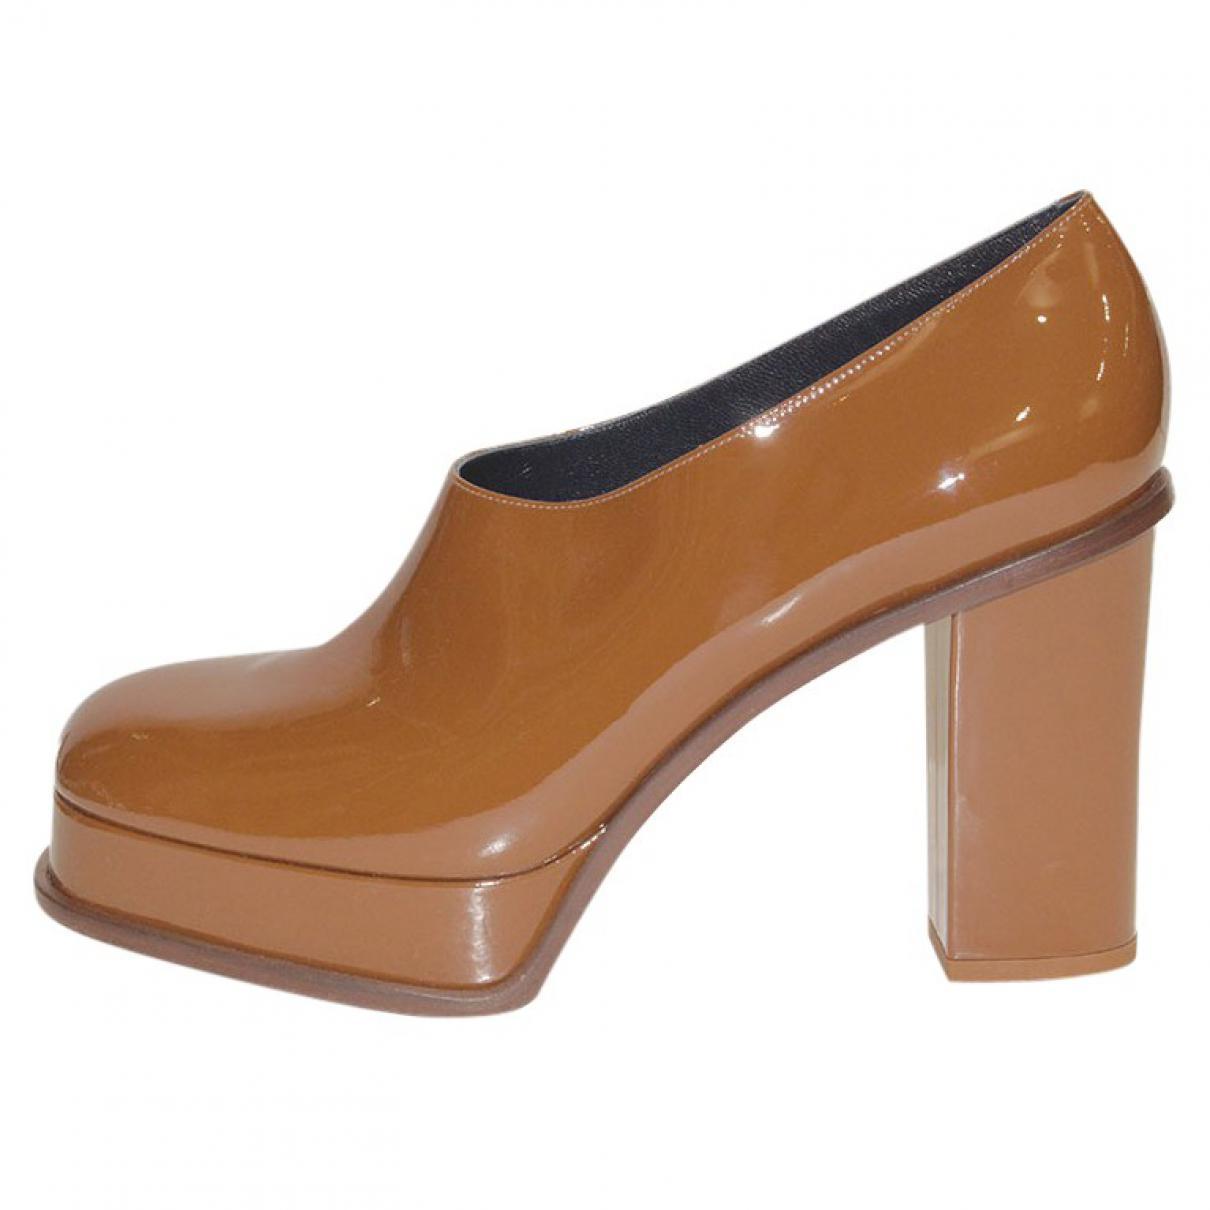 Buy Celine Shoes Uk